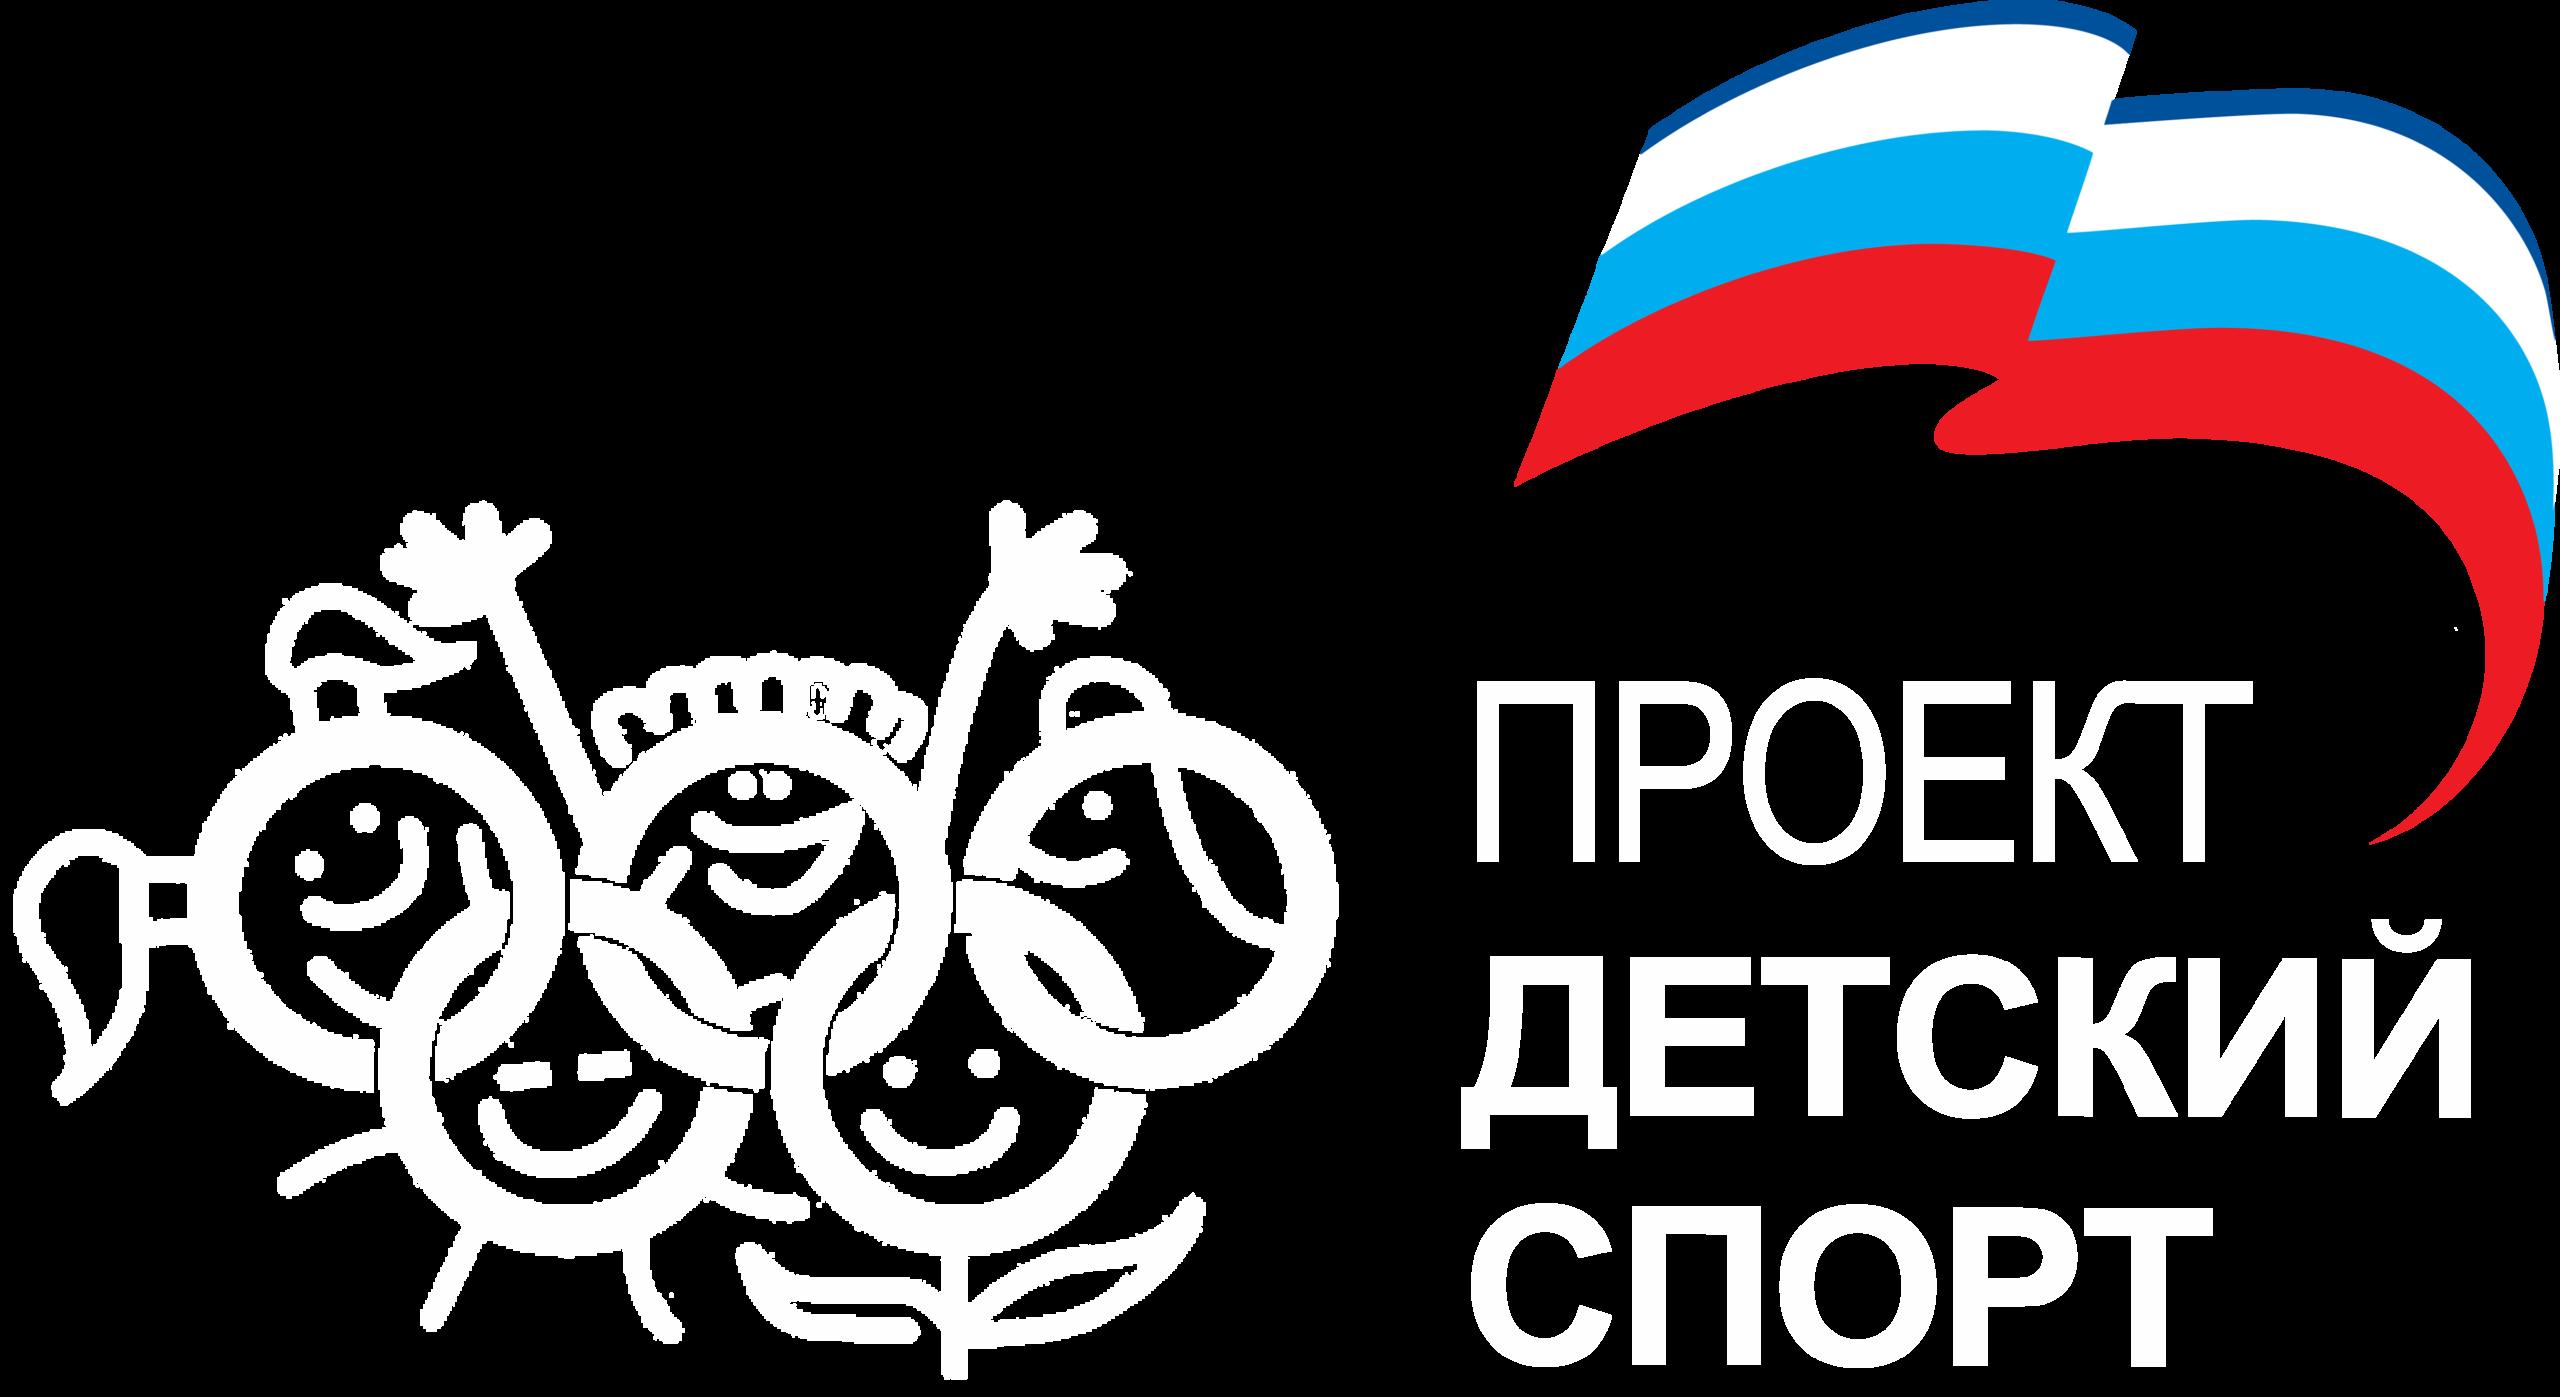 https://dlpp.ru/wp-content/uploads/2019/11/ДетскийСпортБелый-1-1-scaled.png